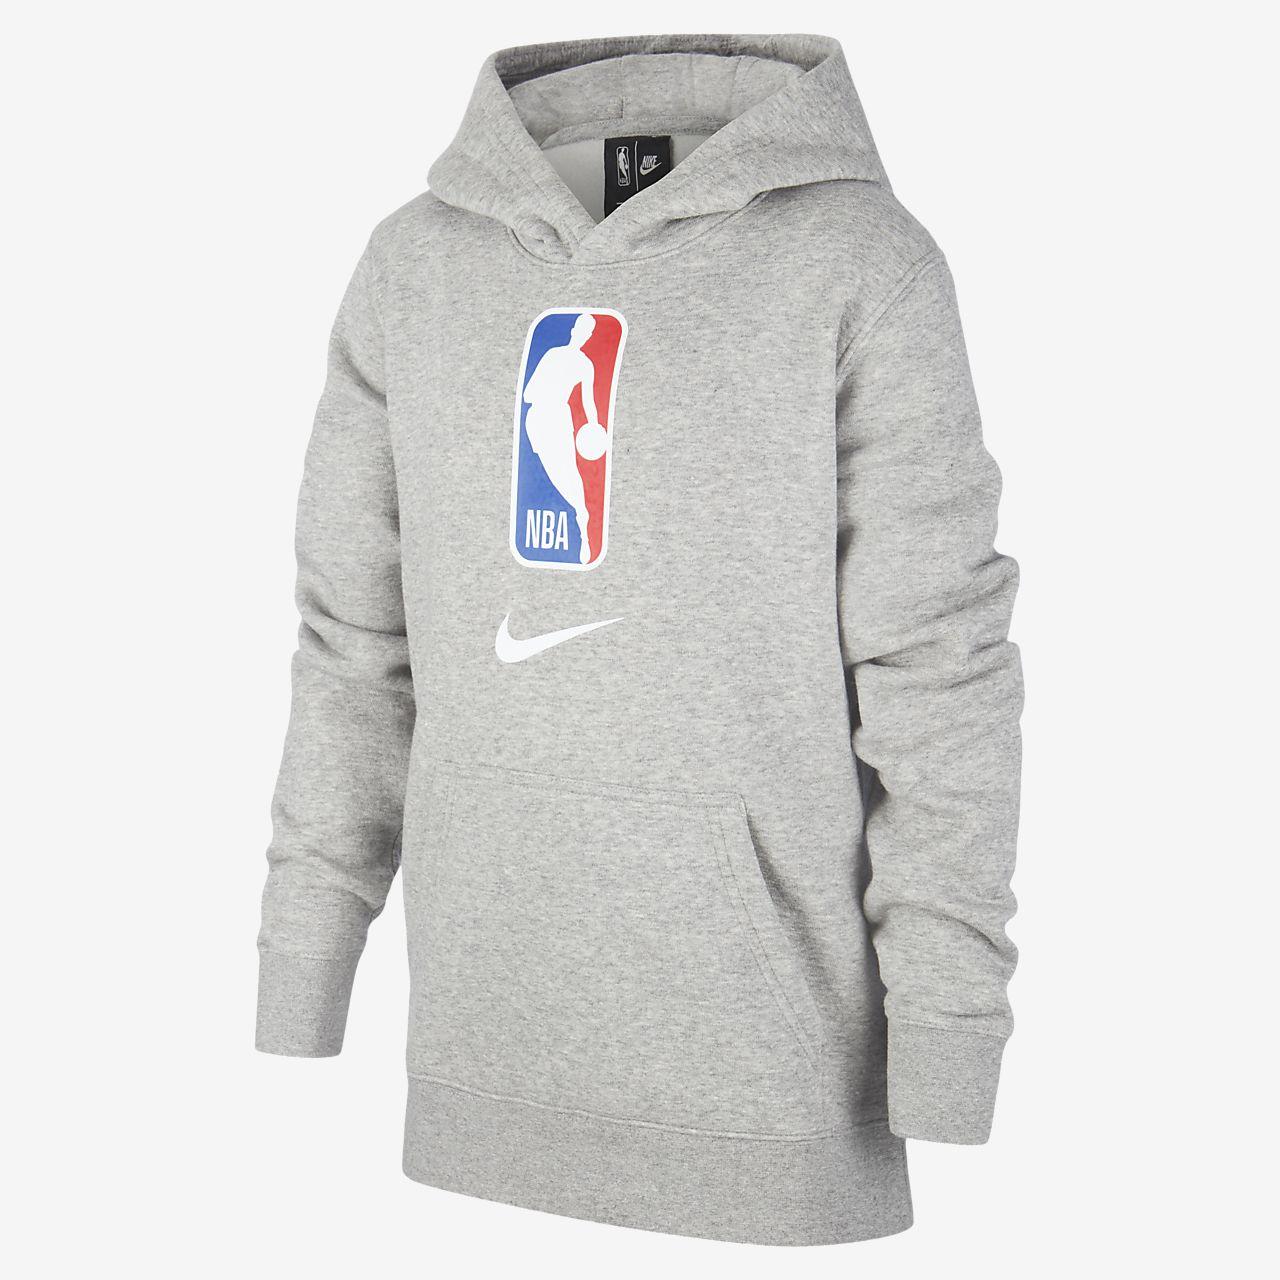 Hoodie NBA Nike Team 31 Júnior